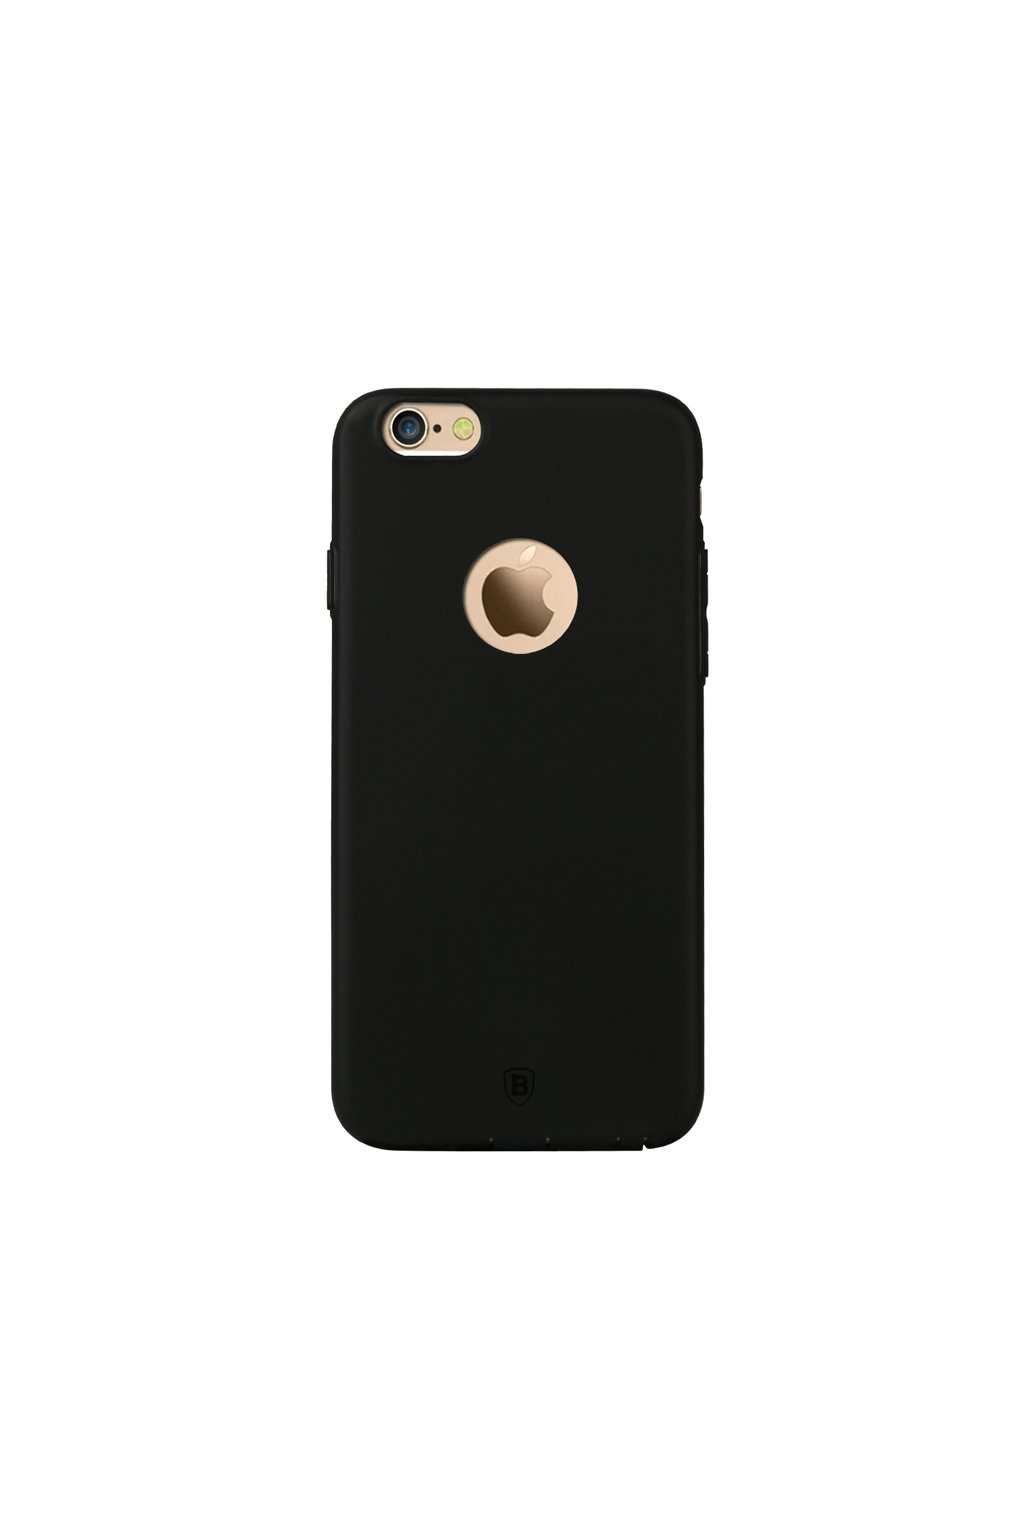 Pouzdro Apple iPhone 6/6S Plus Baseus TPU Mousse, black